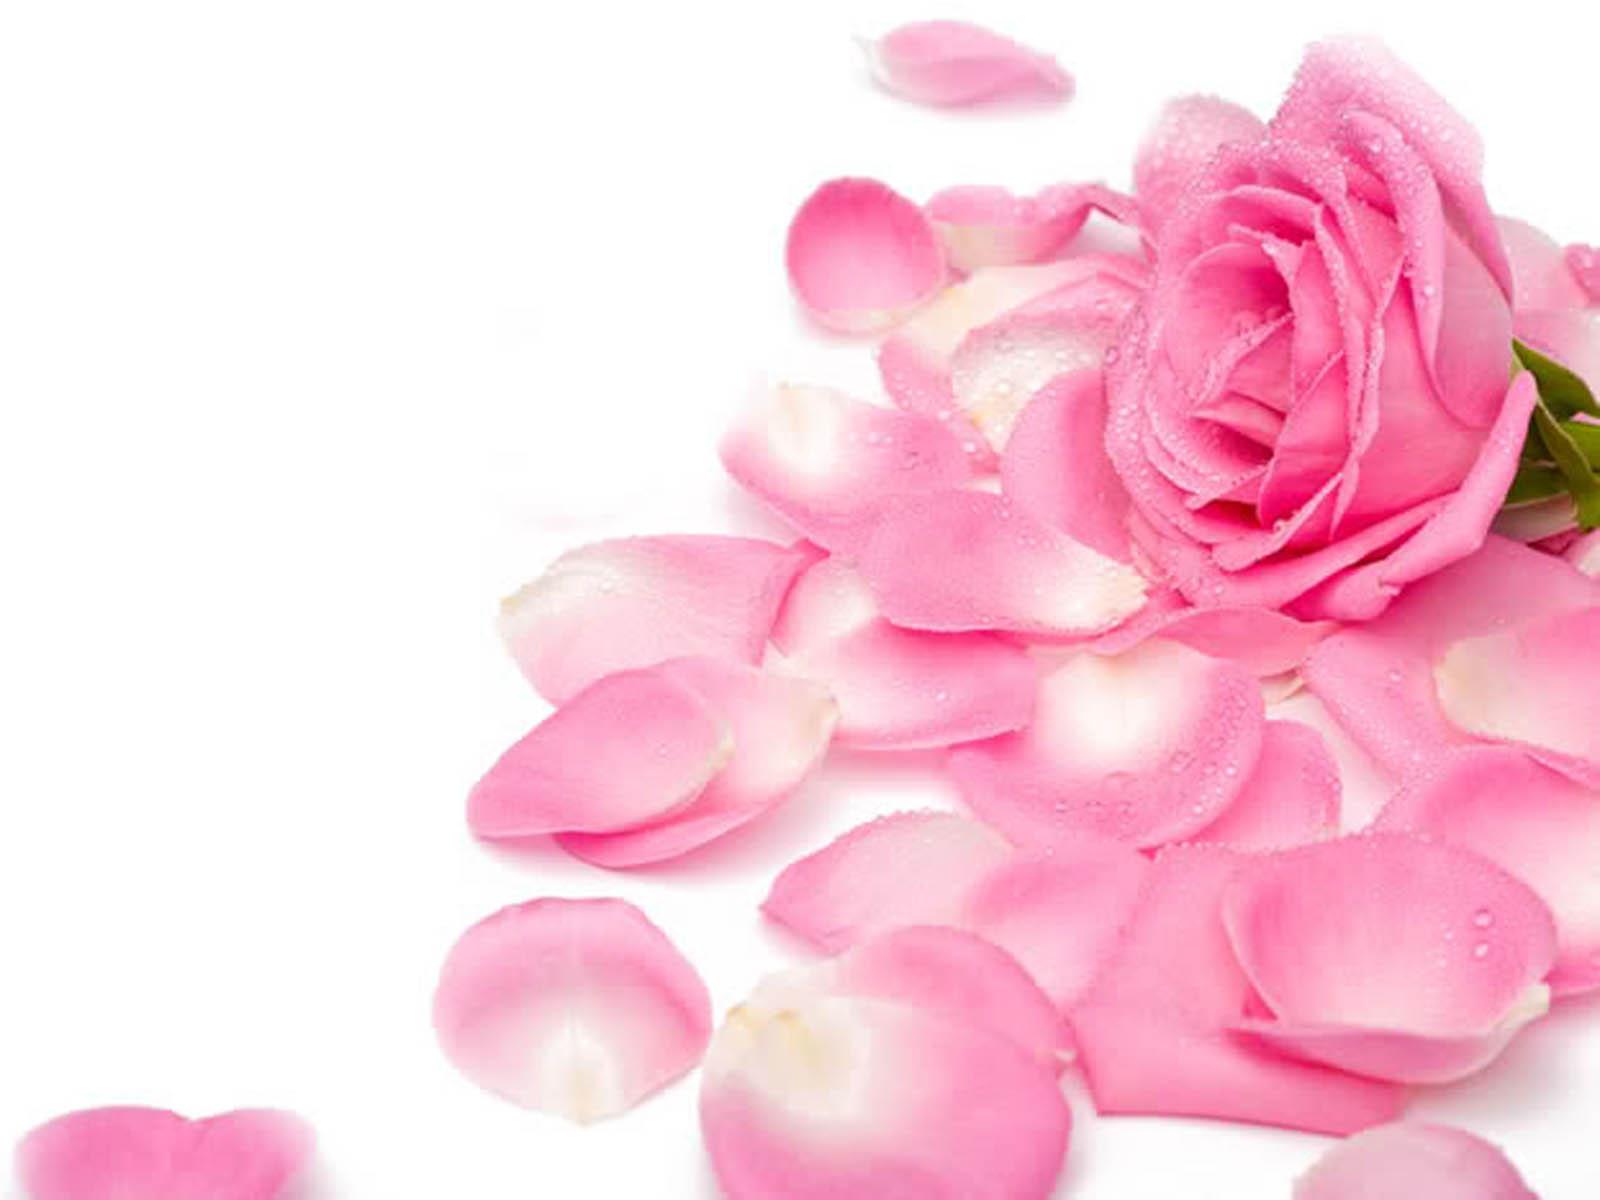 Pretty Pink Rose Wallpaper   Colors Wallpaper 34511727 1600x1200